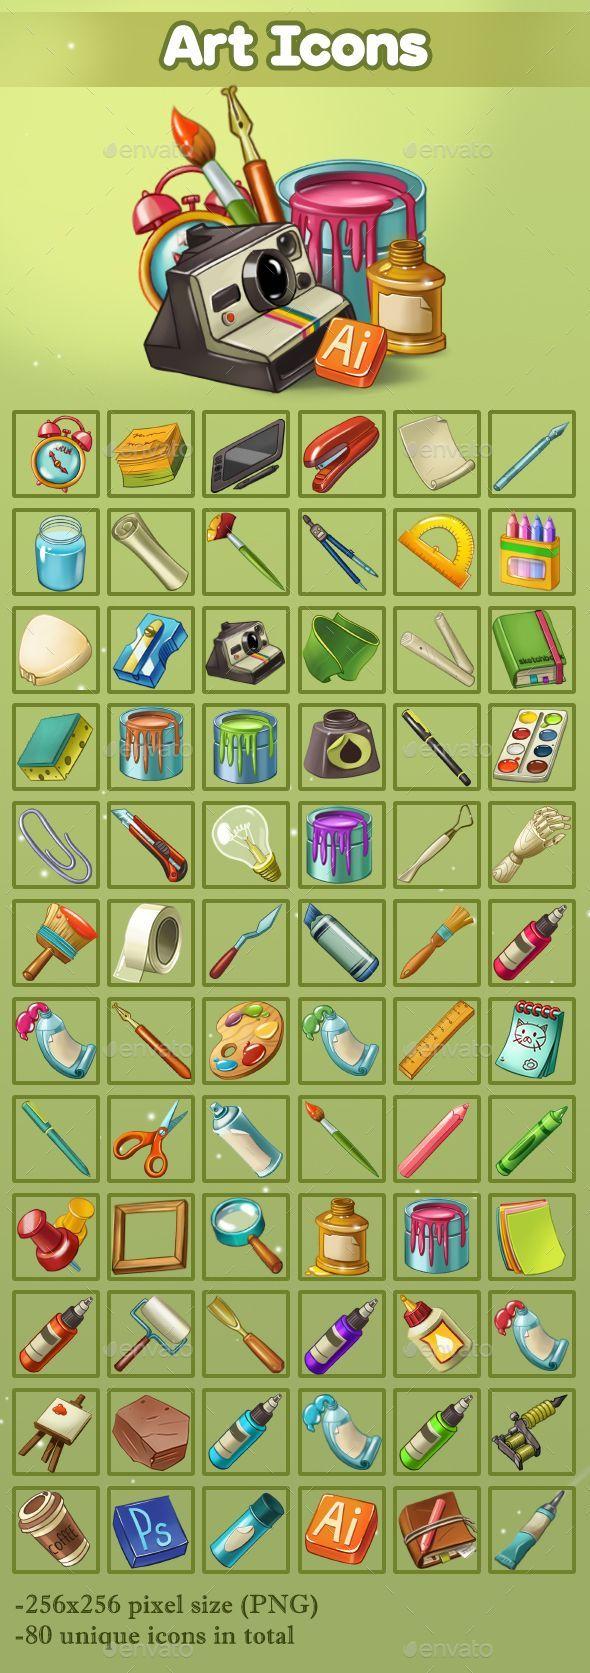 Settings Game Art Icon in 2020 Art icon, Game icon